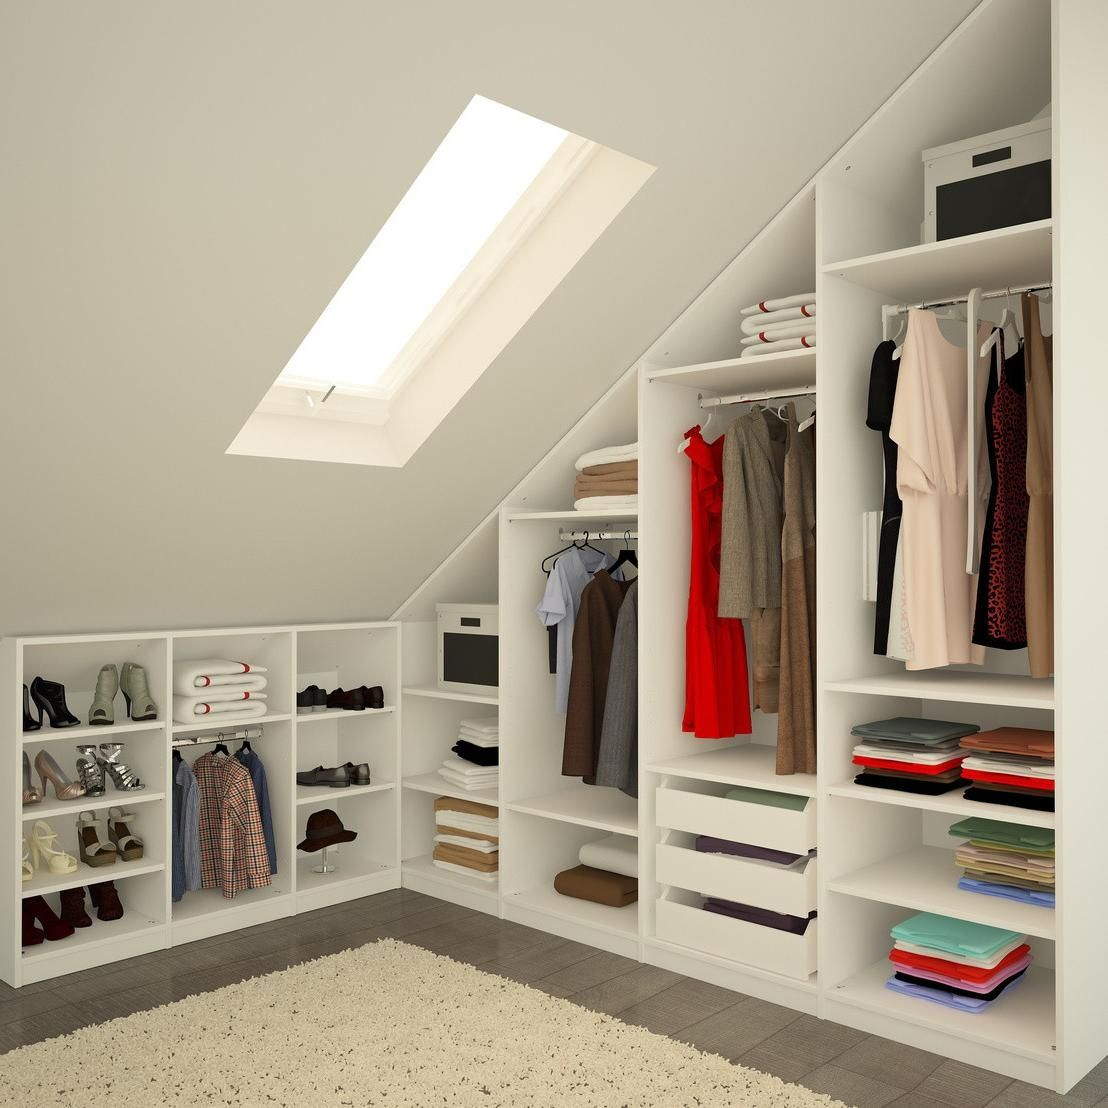 Small Attic Bedroom Closet | Small Bedroom | Pinterest